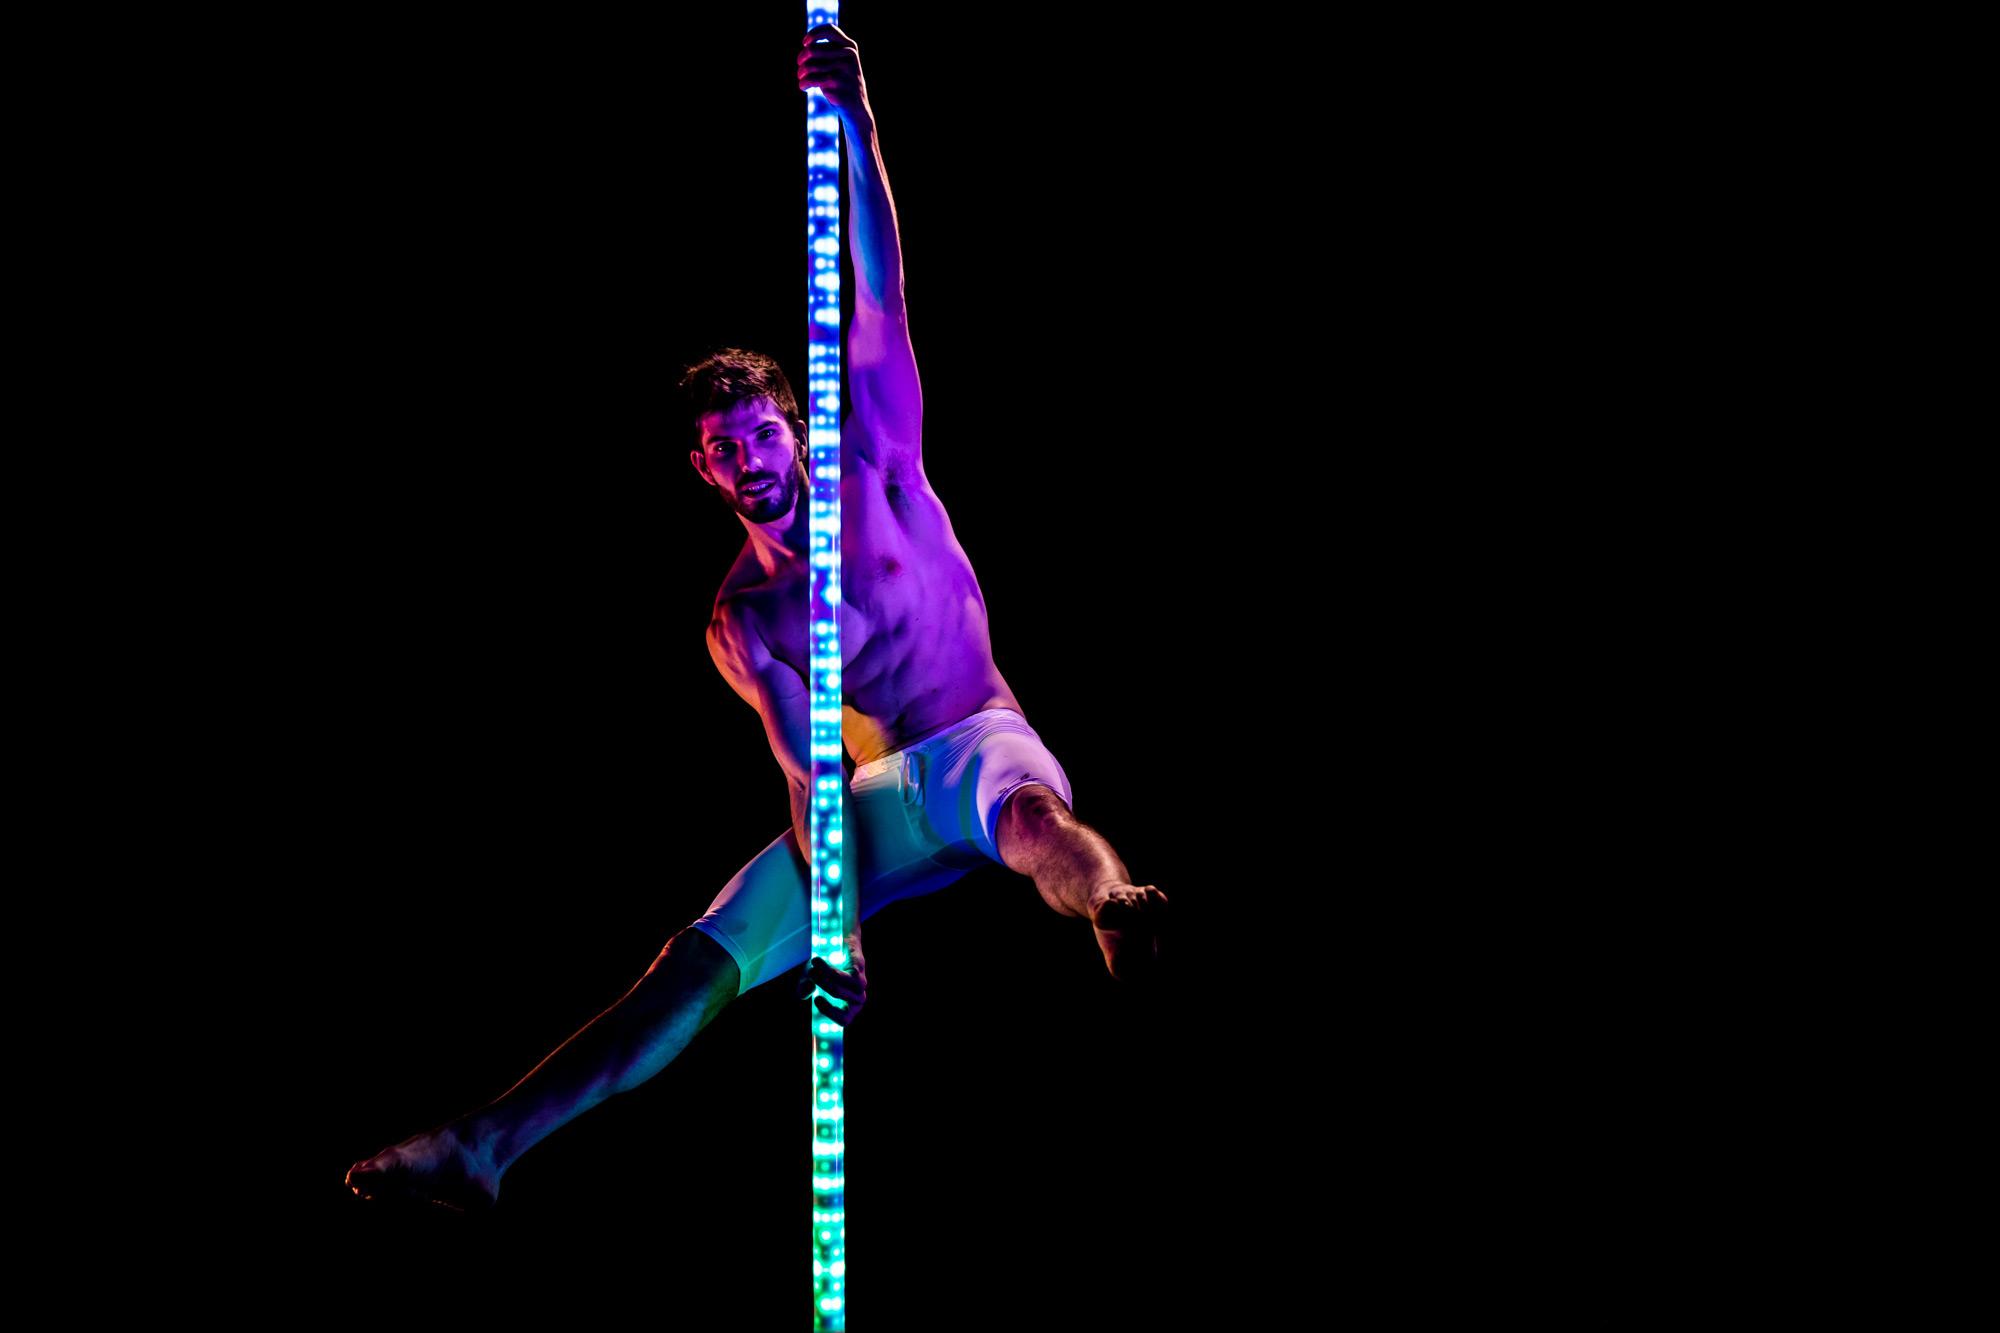 PoleFX LED Dance Pole 8